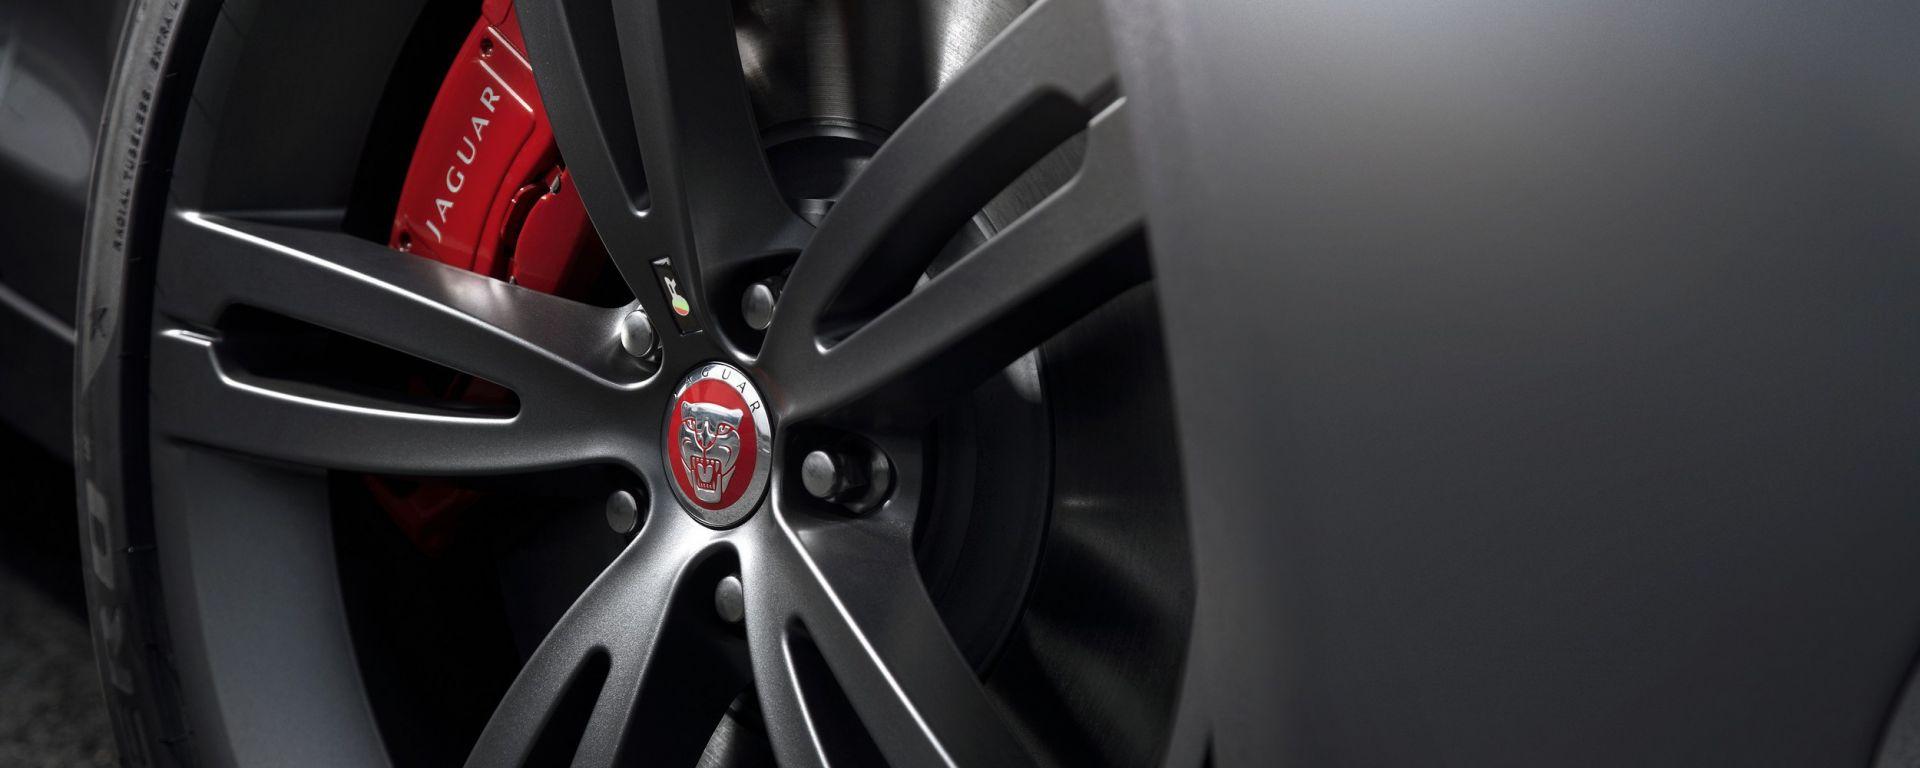 Jaguar XJR 2013, nuove foto e video